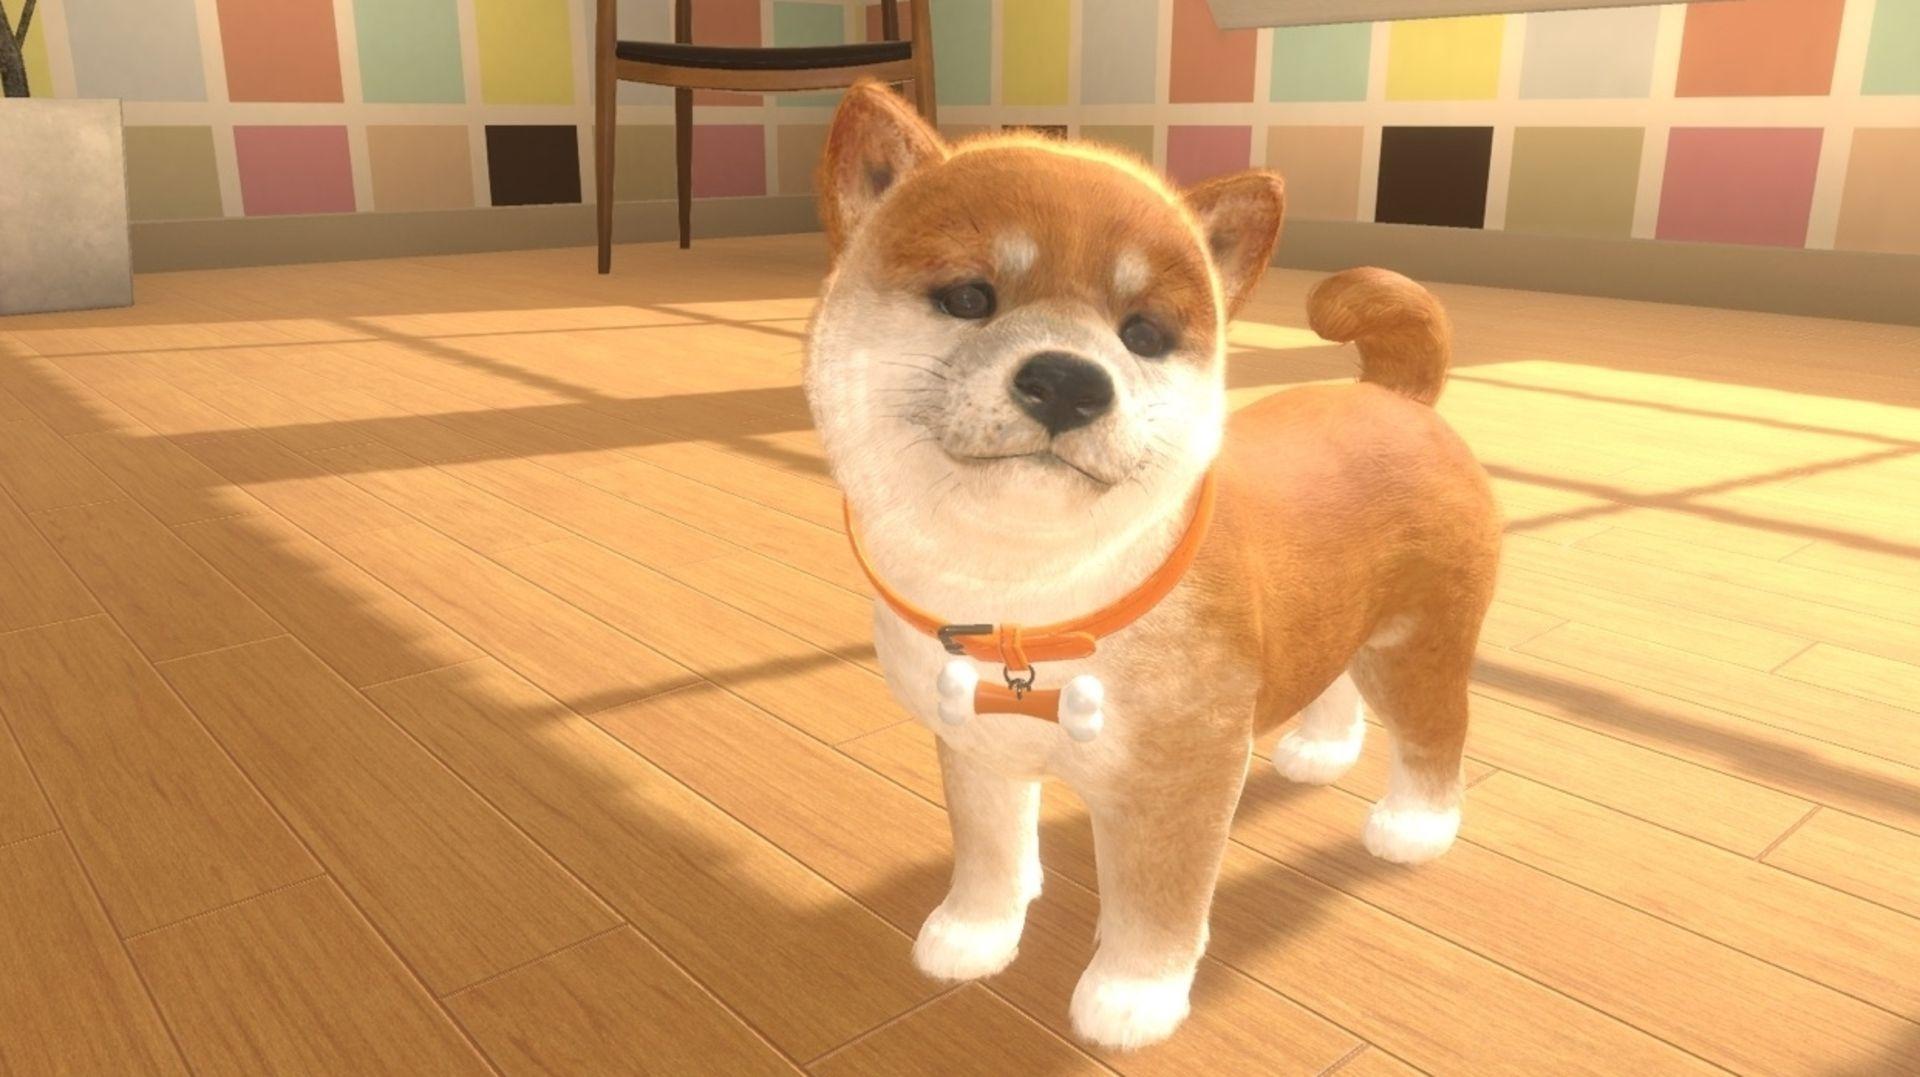 Animate a adoptar una mascota virtual